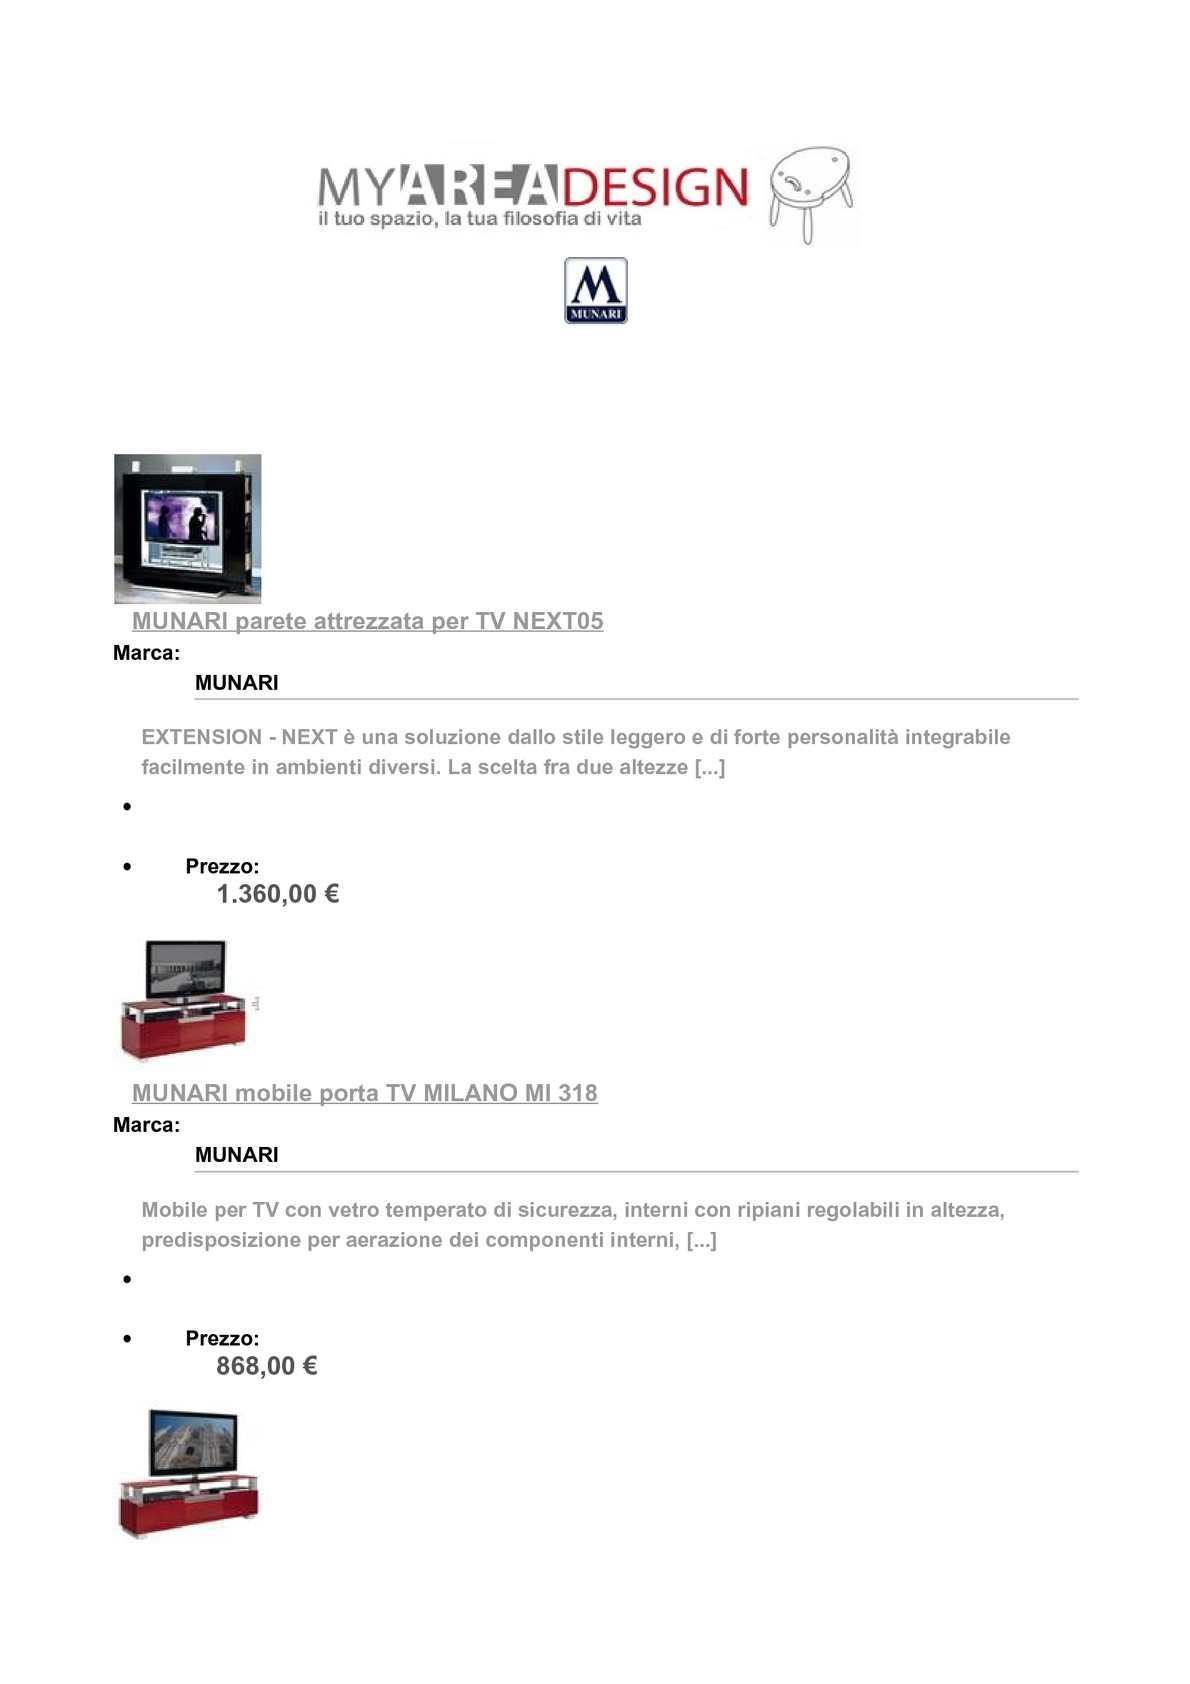 Mobile Porta Tv Cristallo Prezzi.Calameo Munari Su Myareadesing It